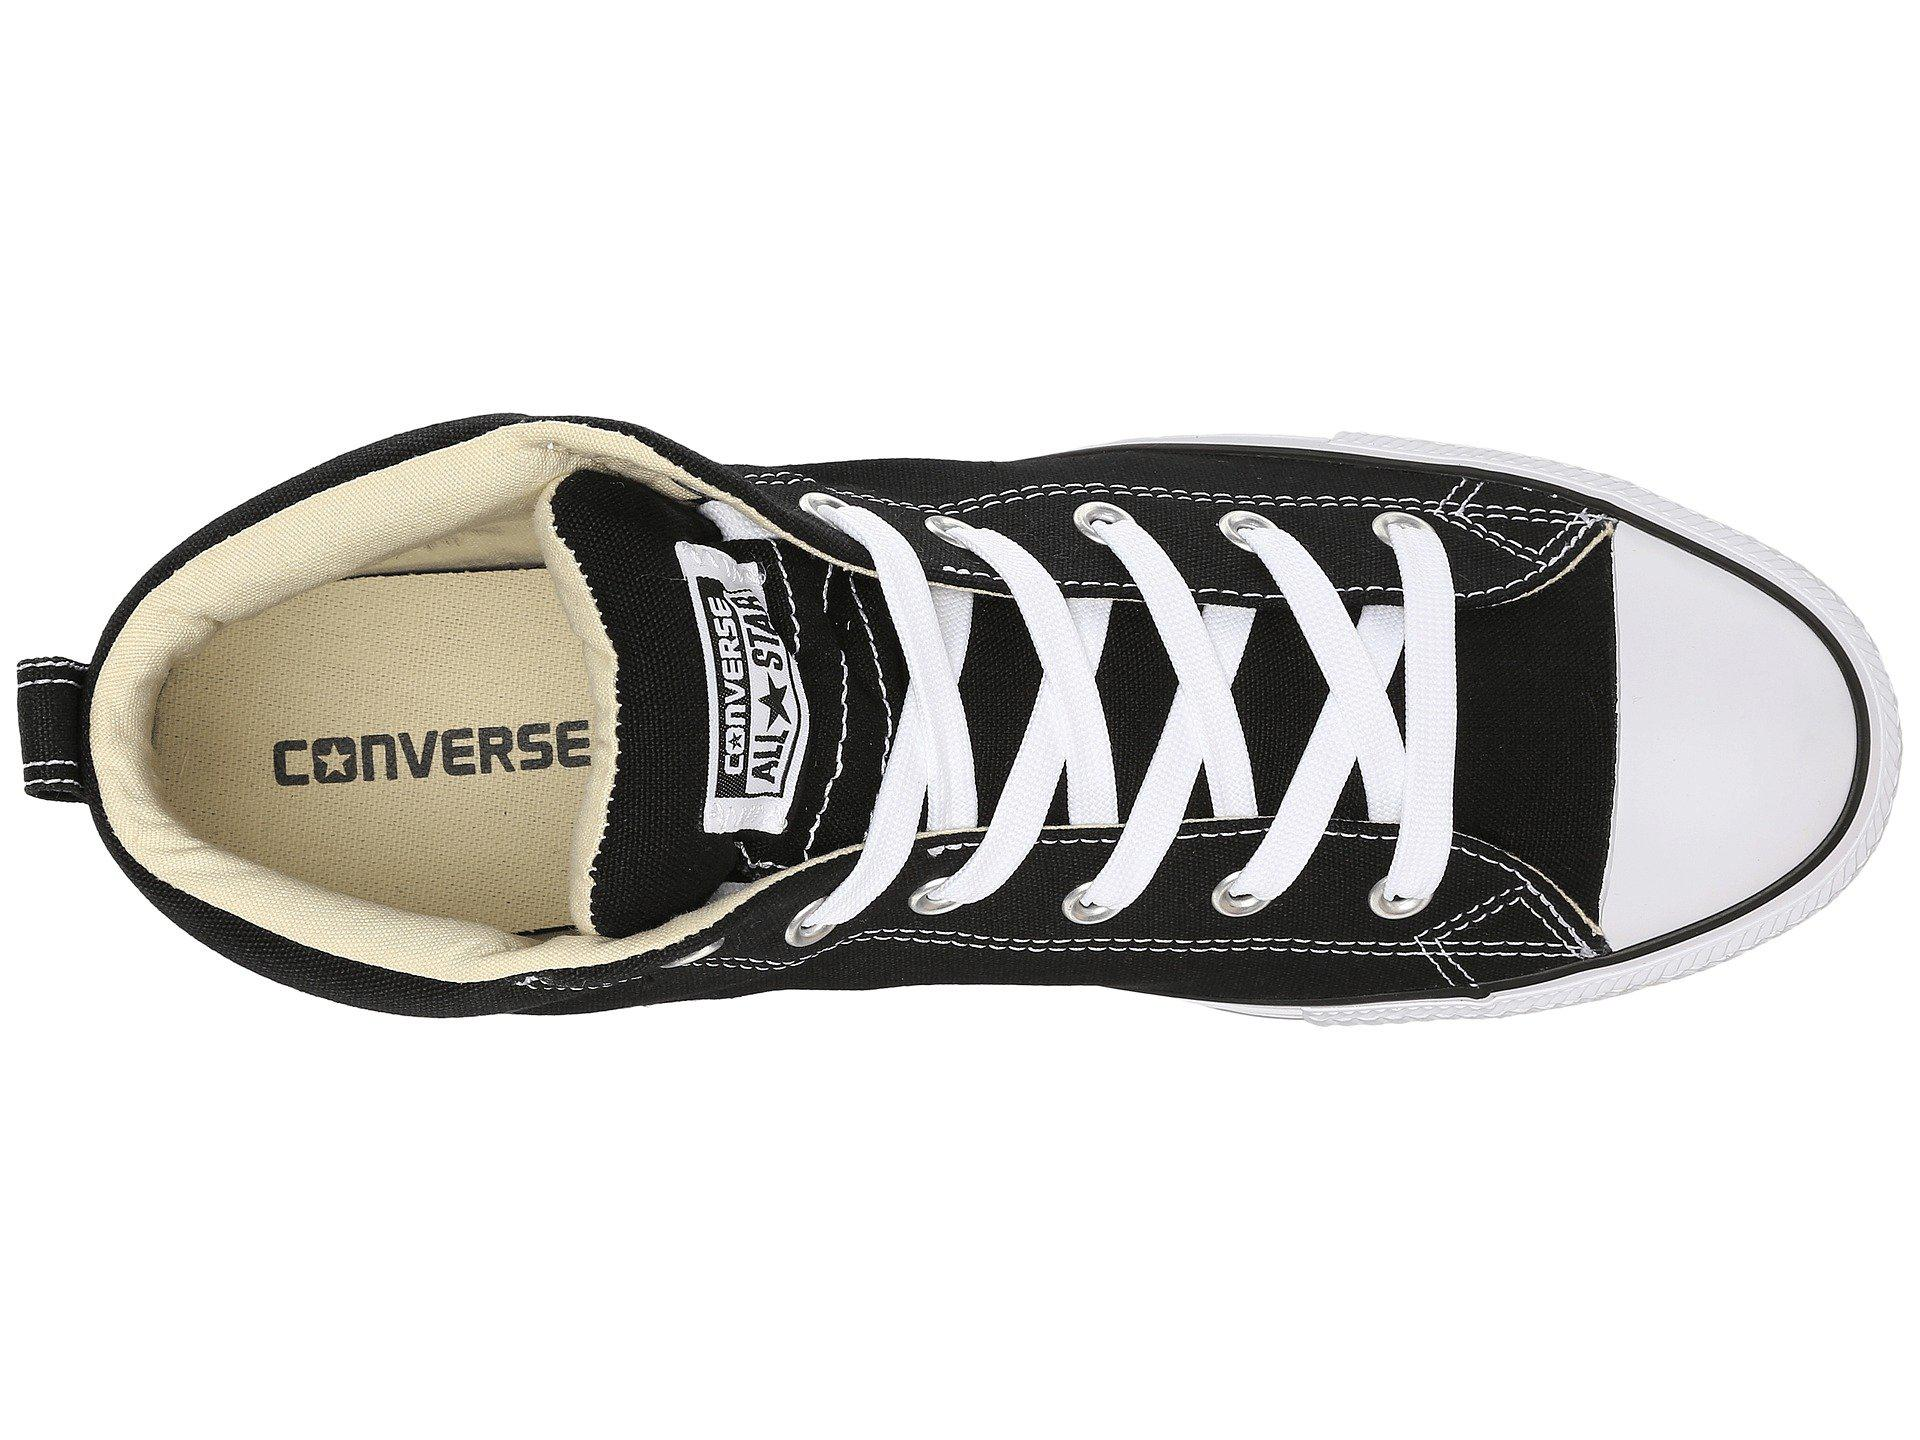 7a9f021662a3f6 Converse - Black Chuck Taylor(r) All Star(r) Street Core Canvas. View  fullscreen